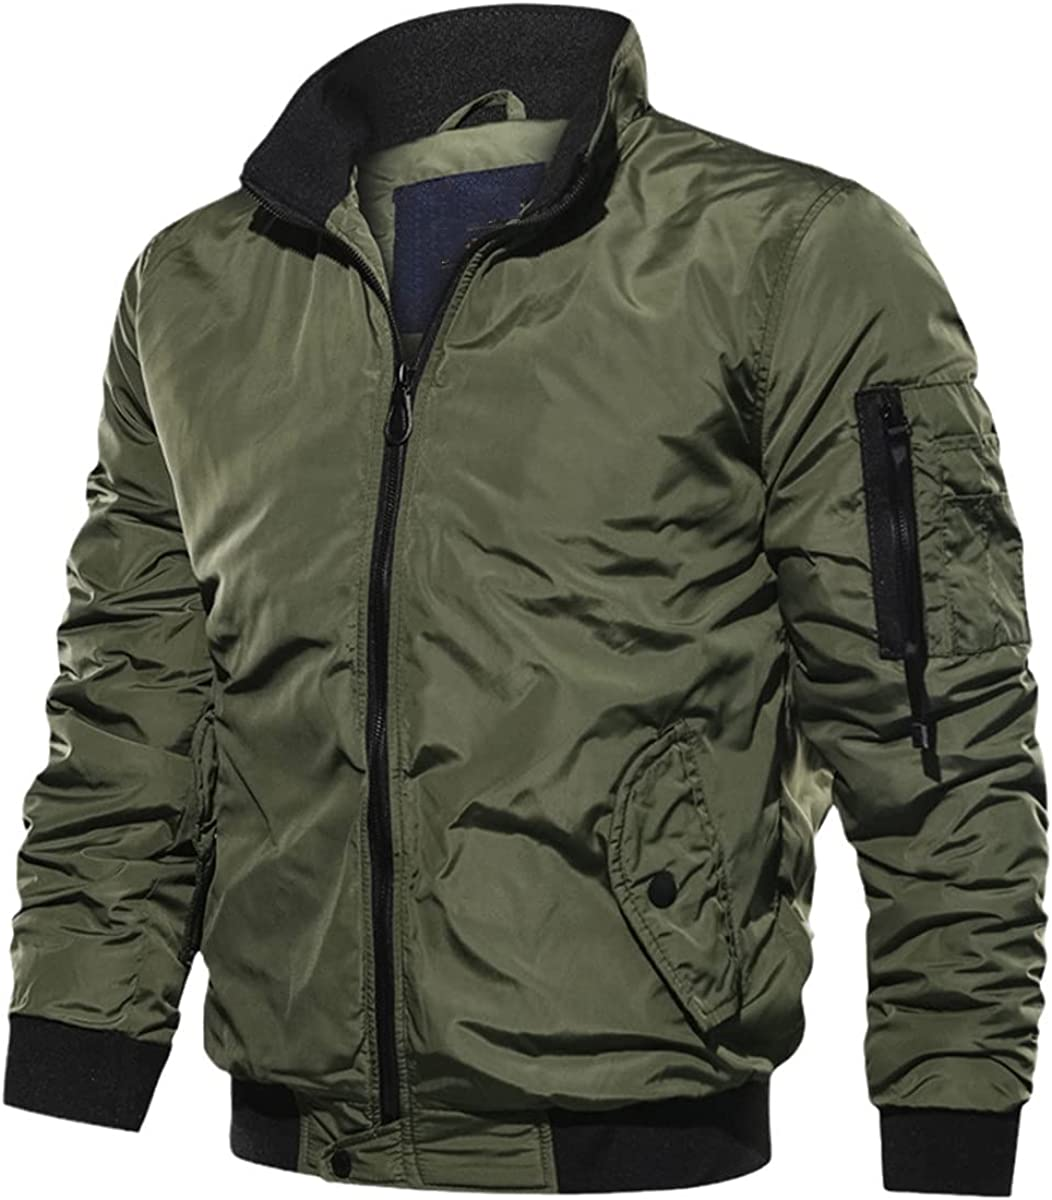 Military Jacket Men's Slim-Fit Bomber Jacket Winter Men's Jacket Casual Long-Sleeved Jacket